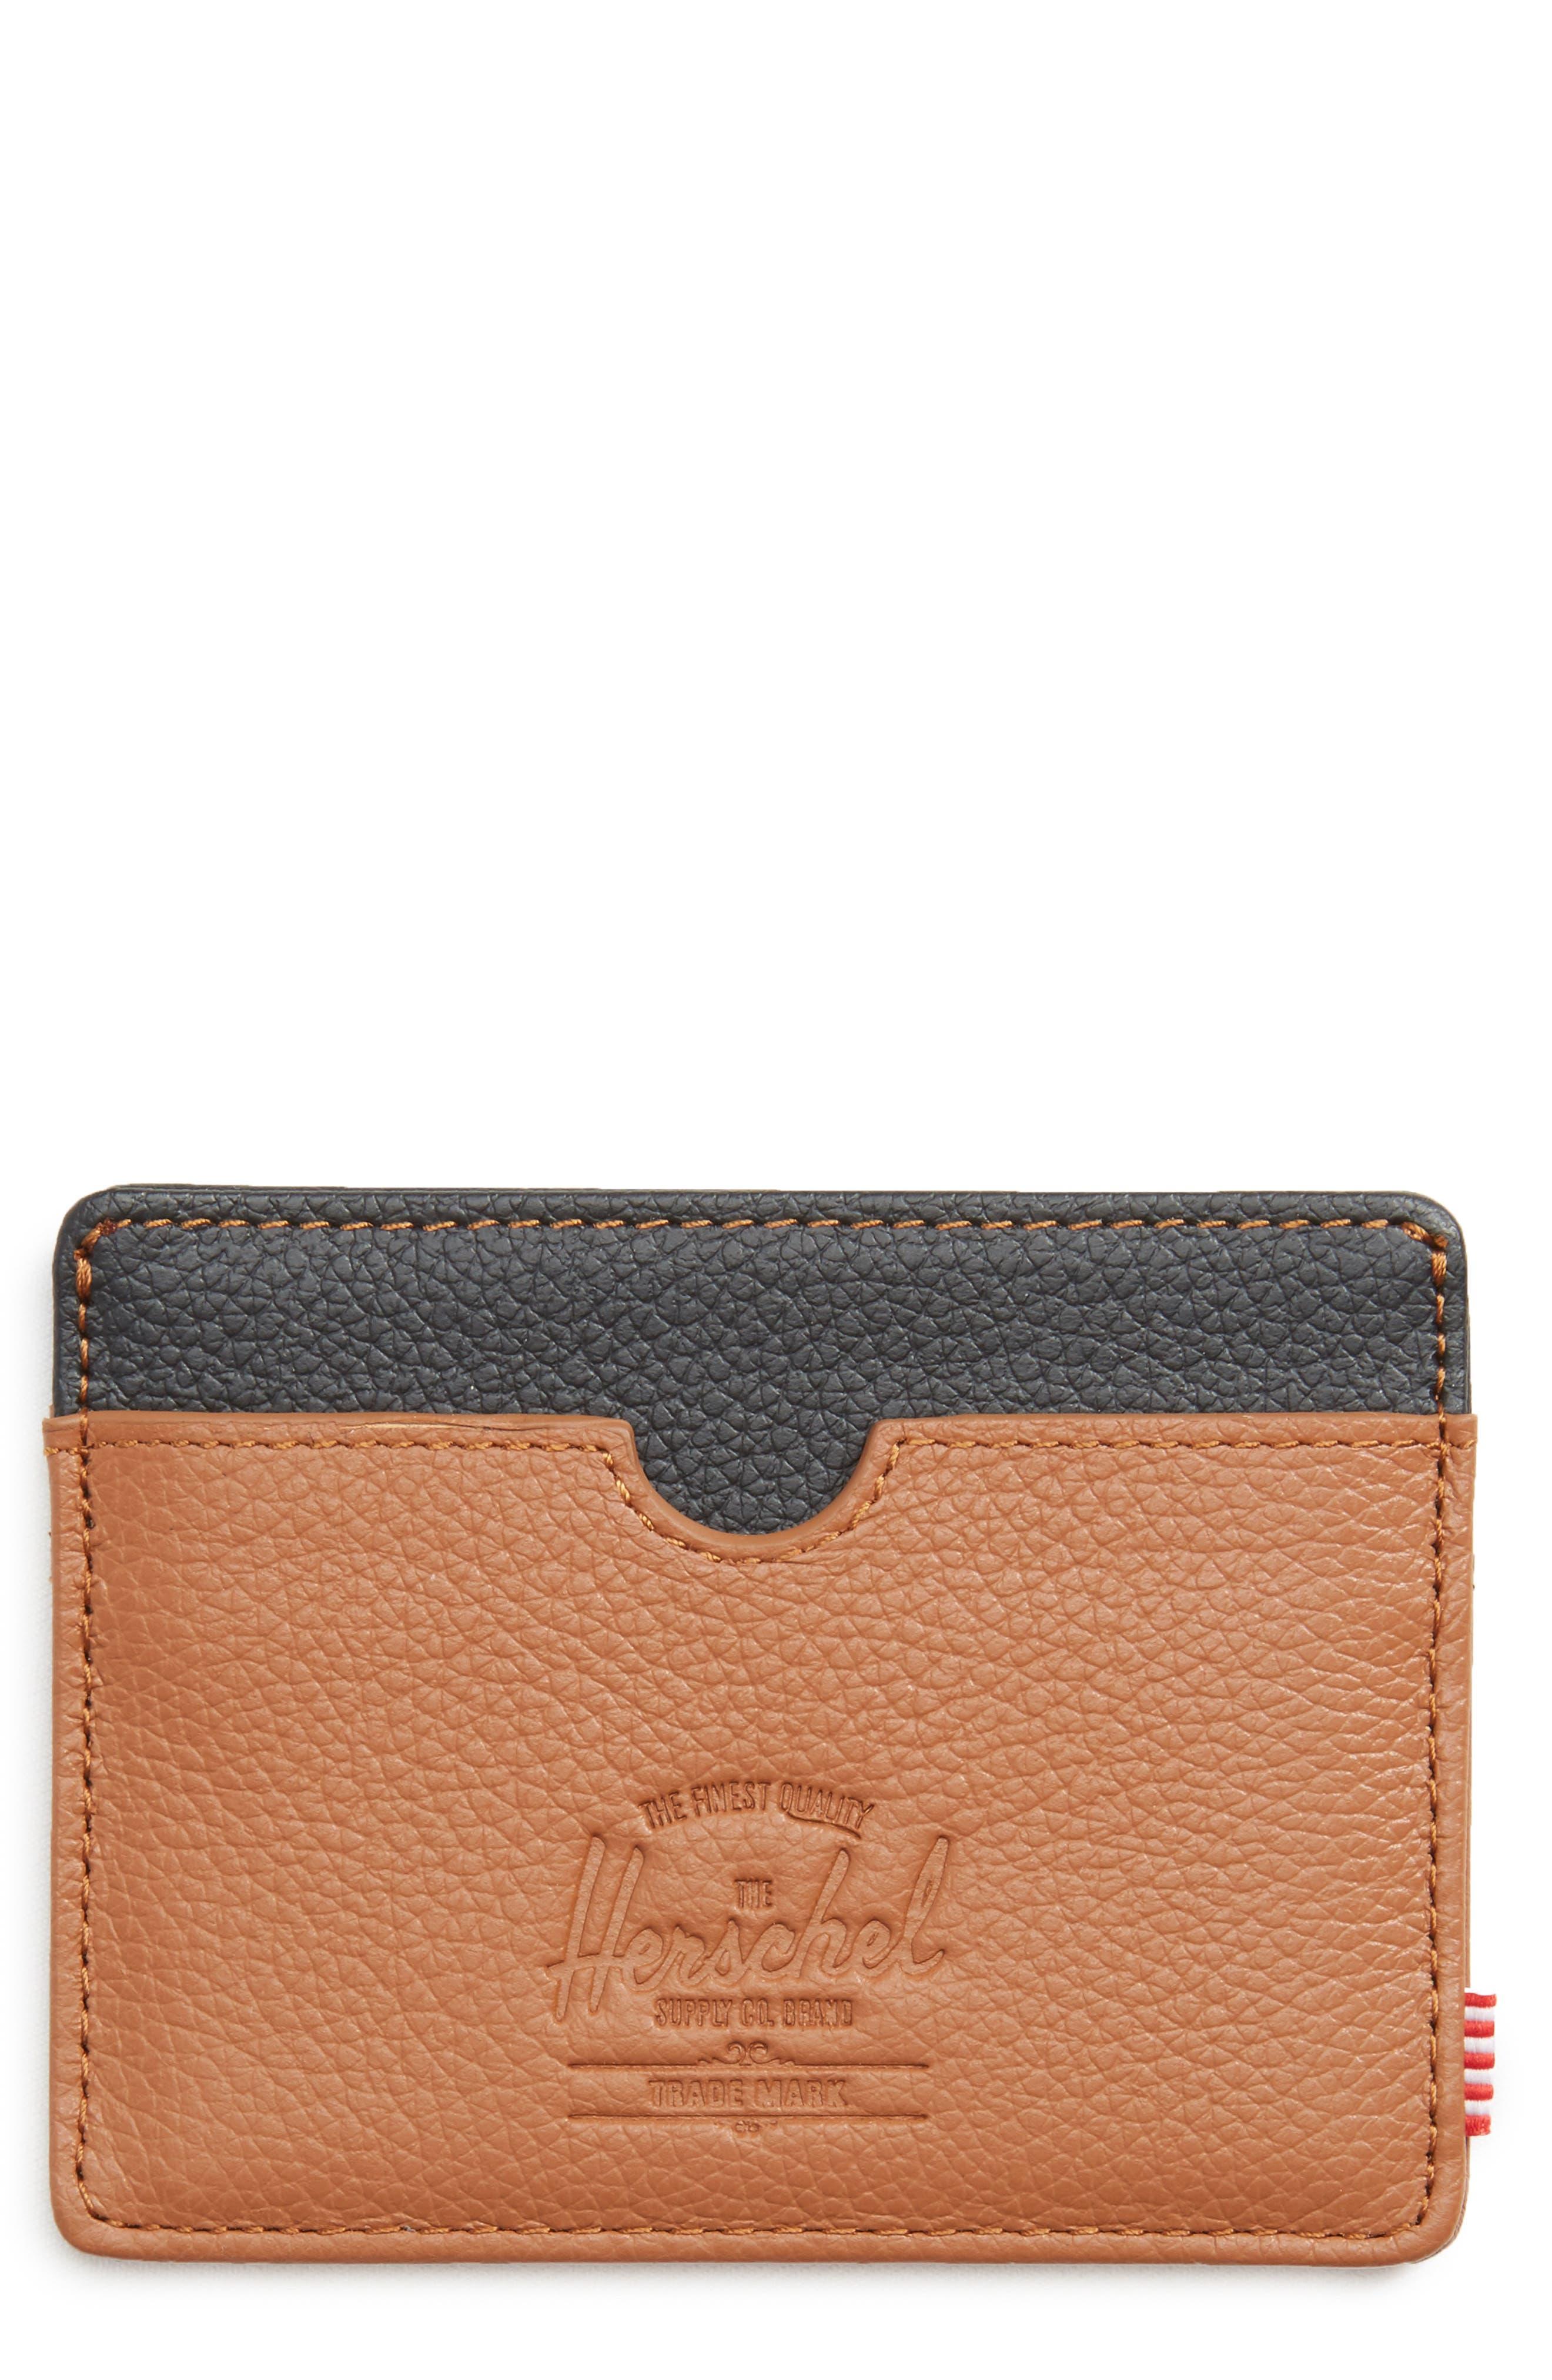 Charlie Pebble Leather Card Case,                         Main,                         color, Tan/ Black Pebble